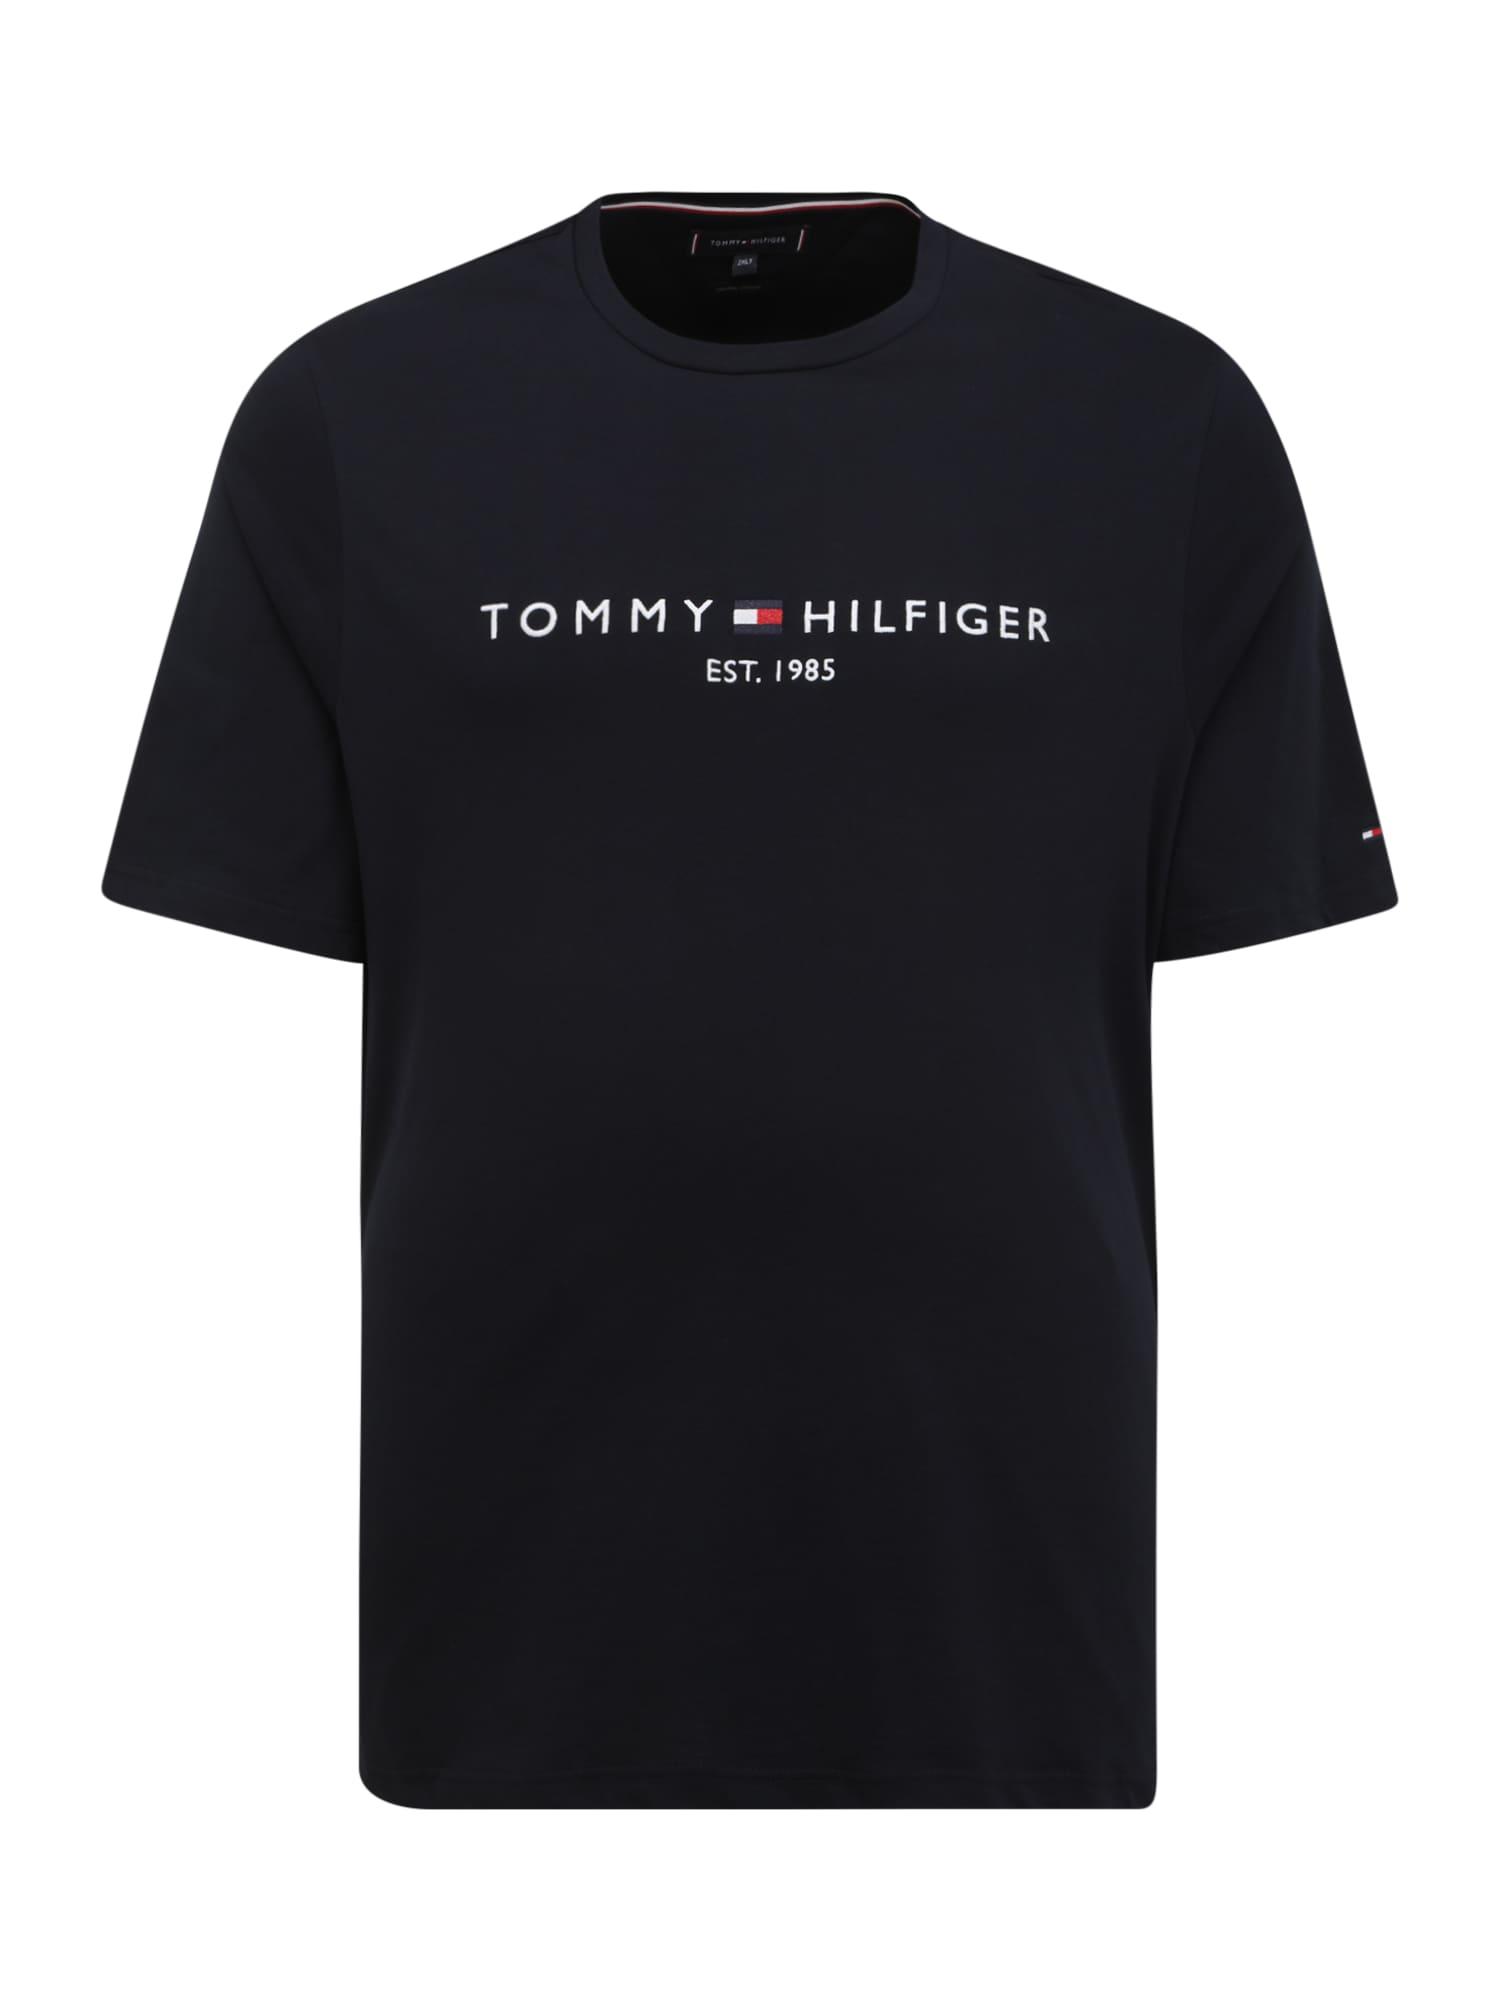 Tommy Hilfiger Big & Tall Marškinėliai tamsiai mėlyna jūros spalva / balta / raudona